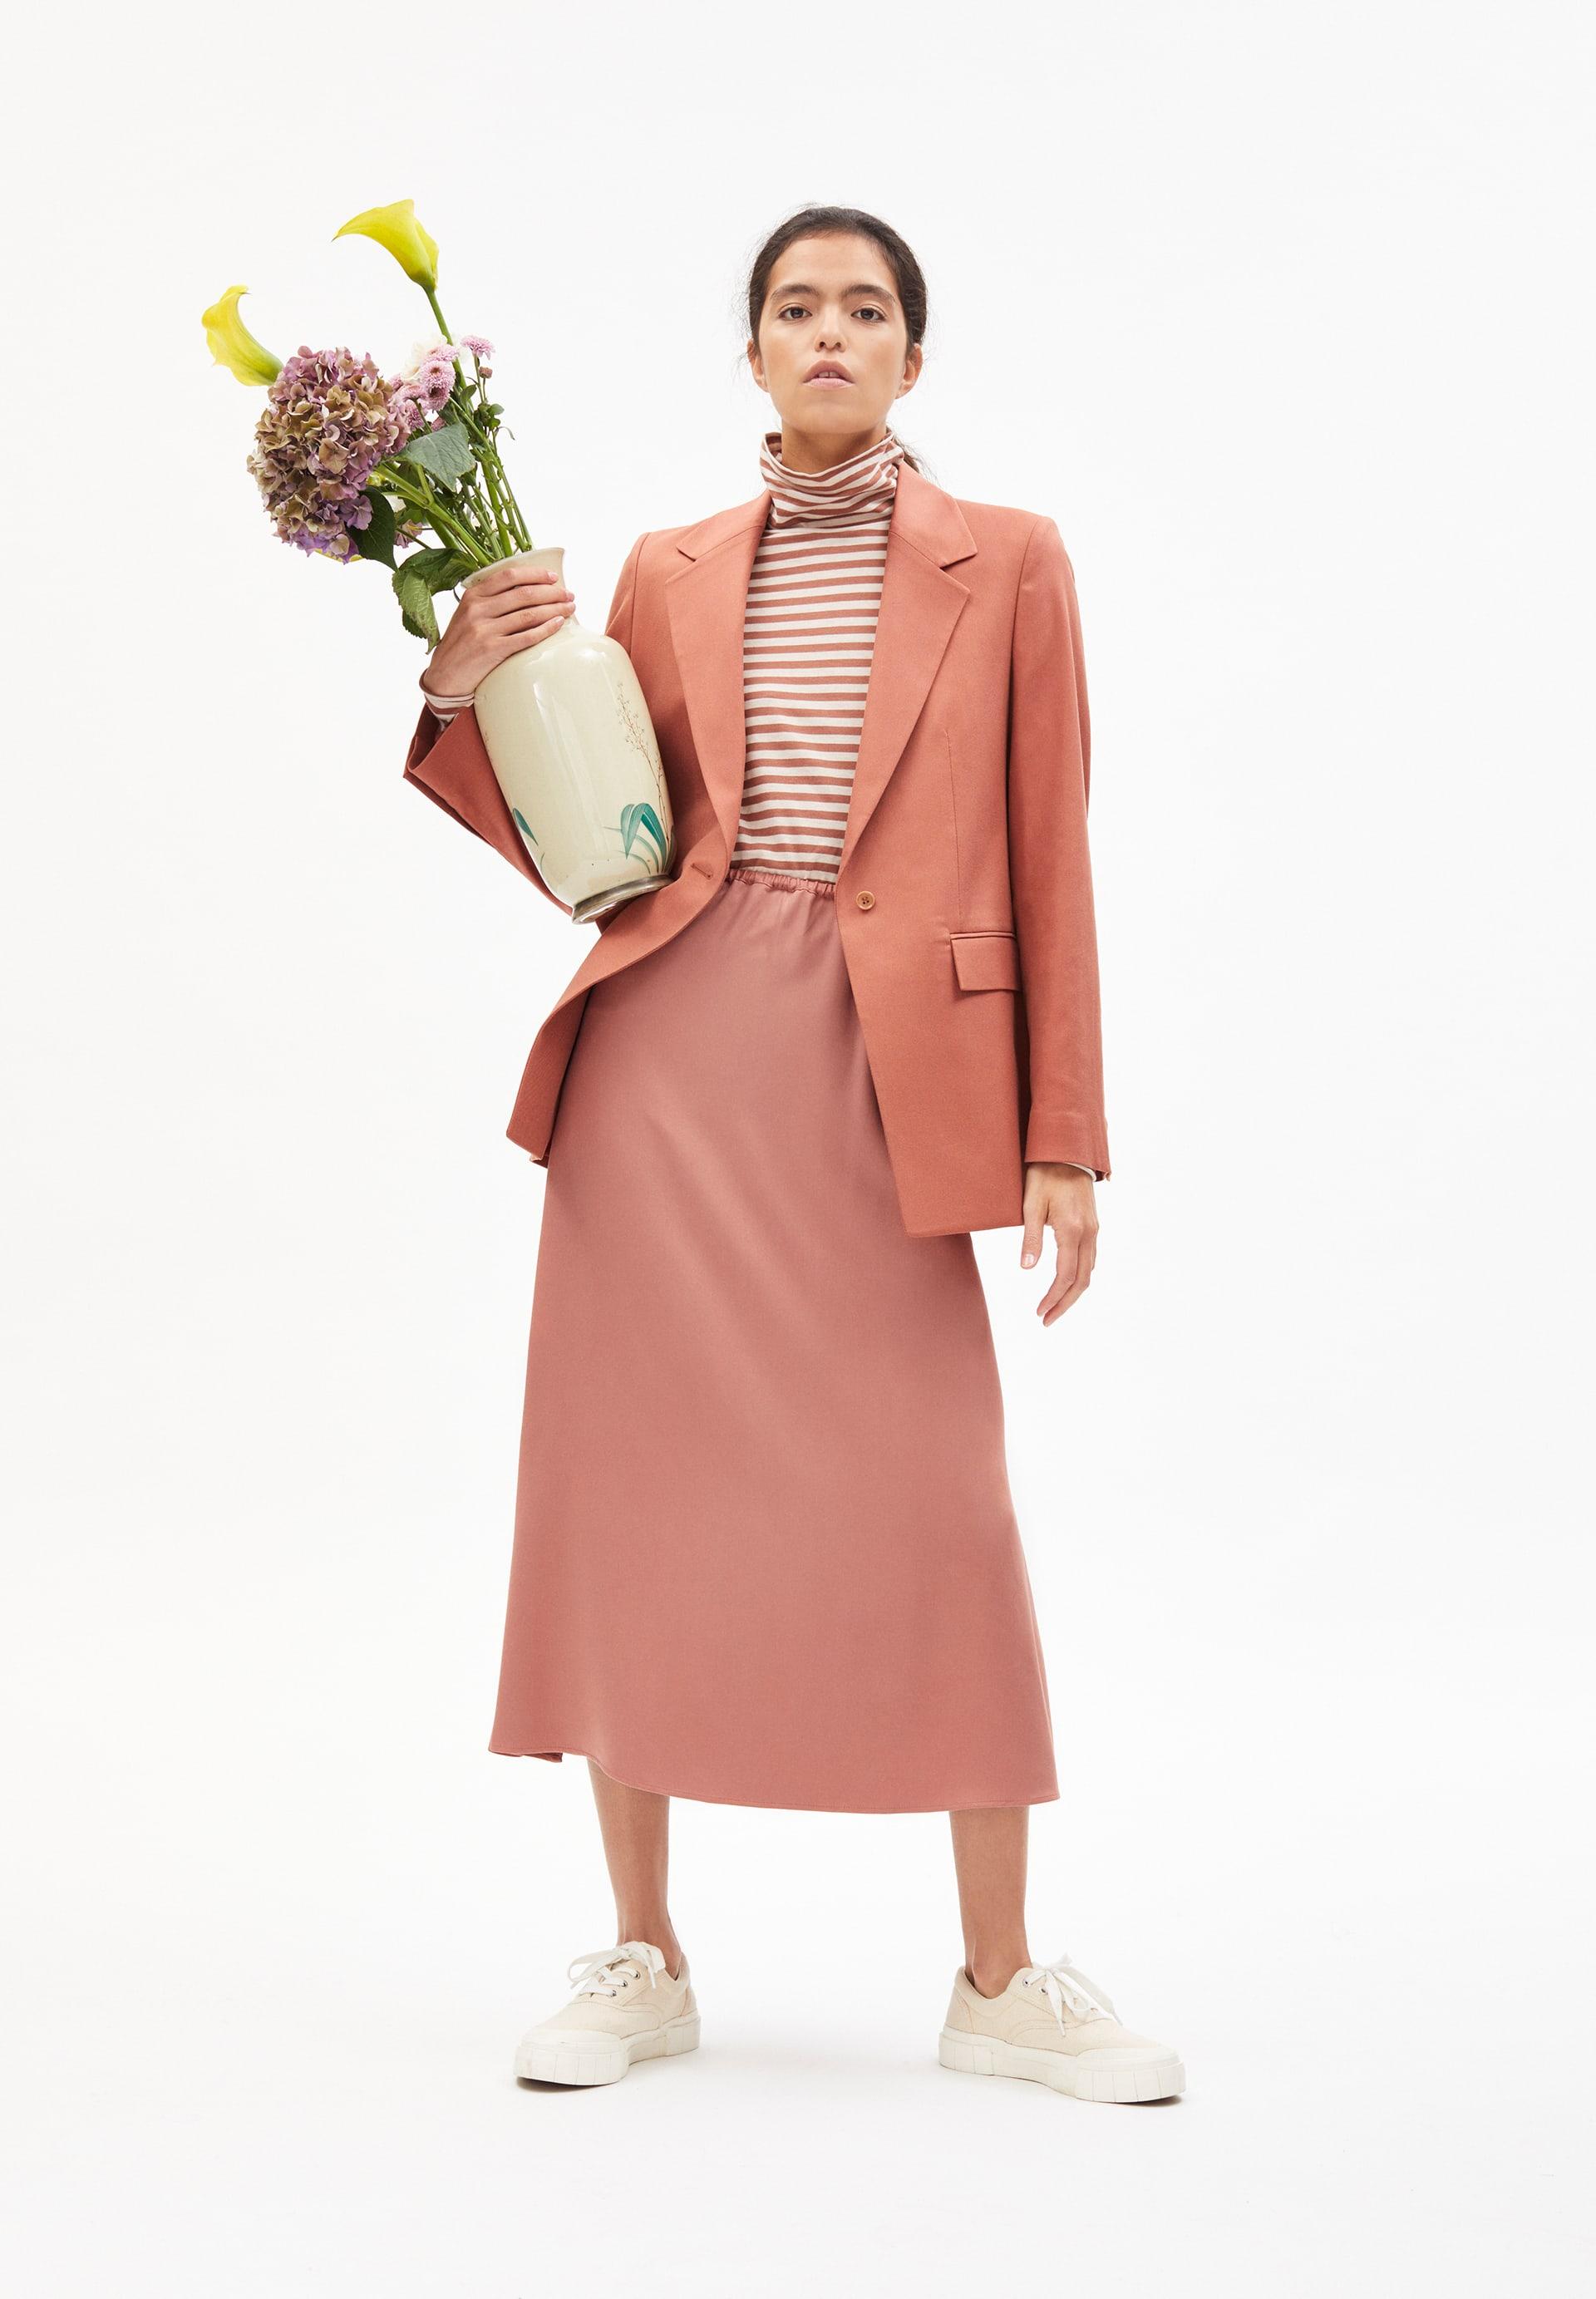 APOLONIAA Woven Skirt made of LENZING™ ECOVERO™